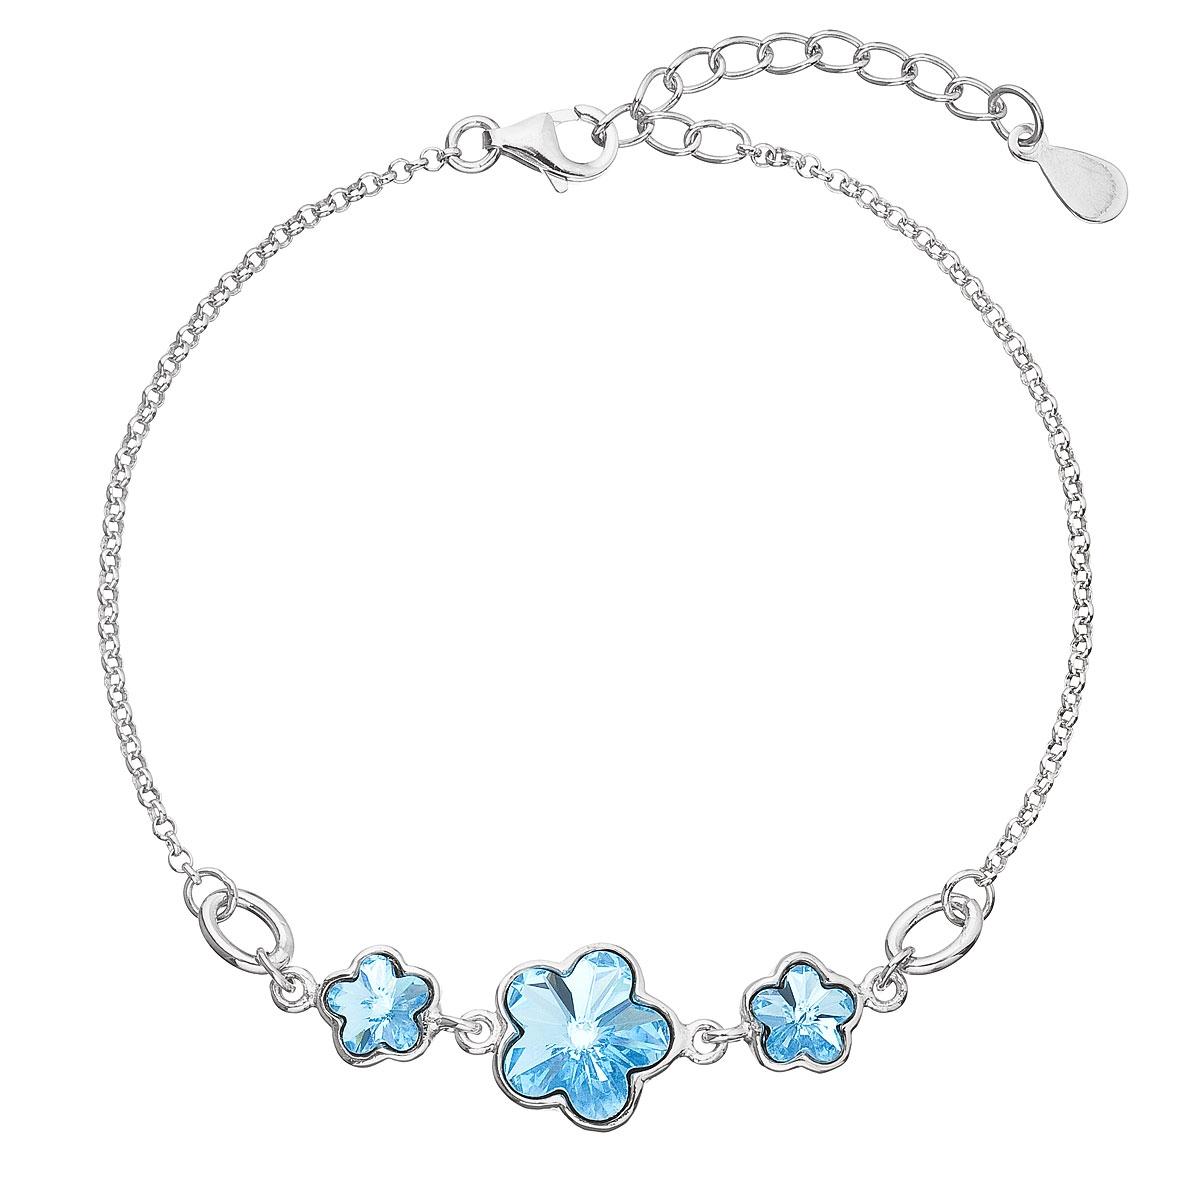 Stříbrný náramek s kytičkami Crystals from Swarovski® Aqua EG7050-AQ